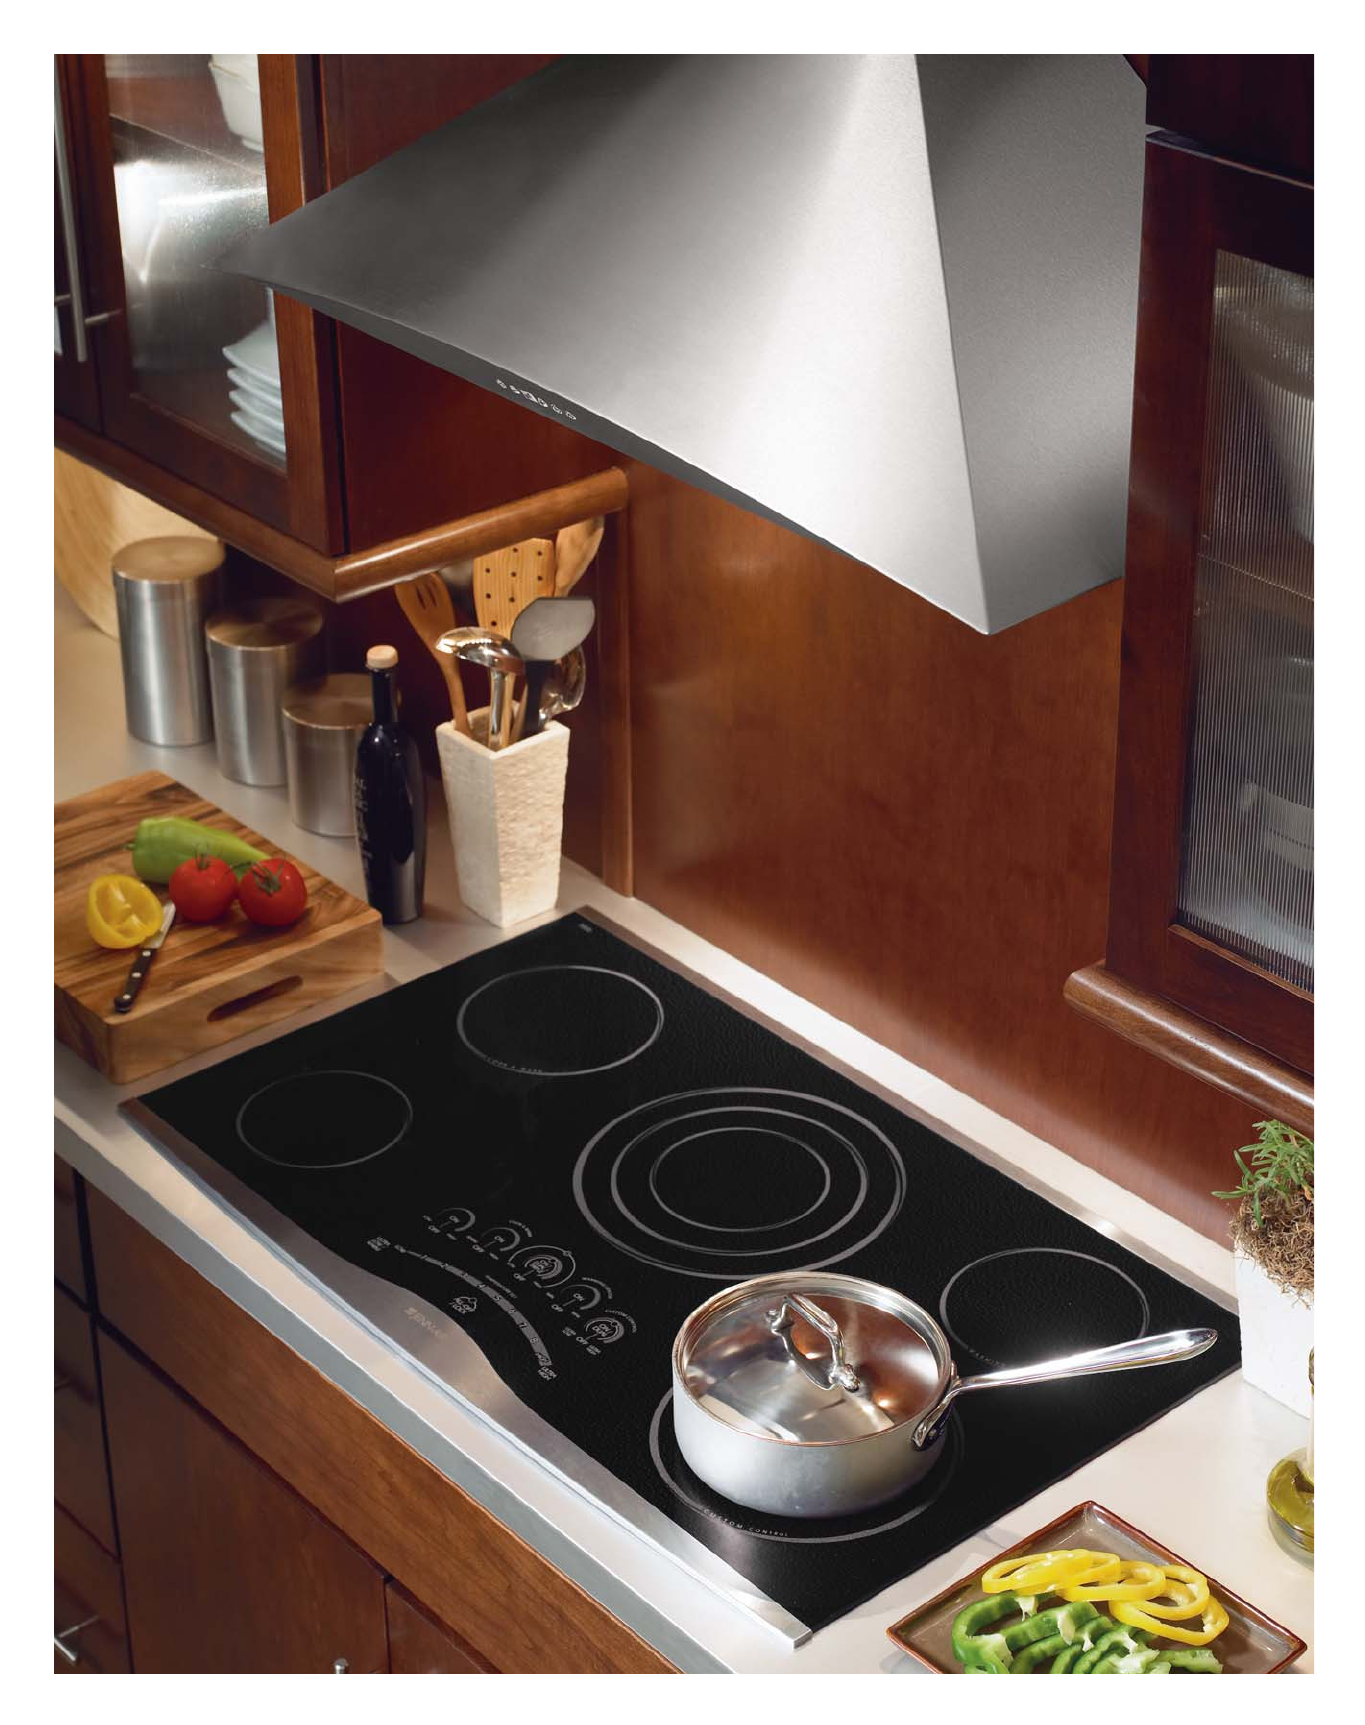 P16 28 Cooktops Pro Style Jgcp636adp Jenn Air Cooktops1104 Rev